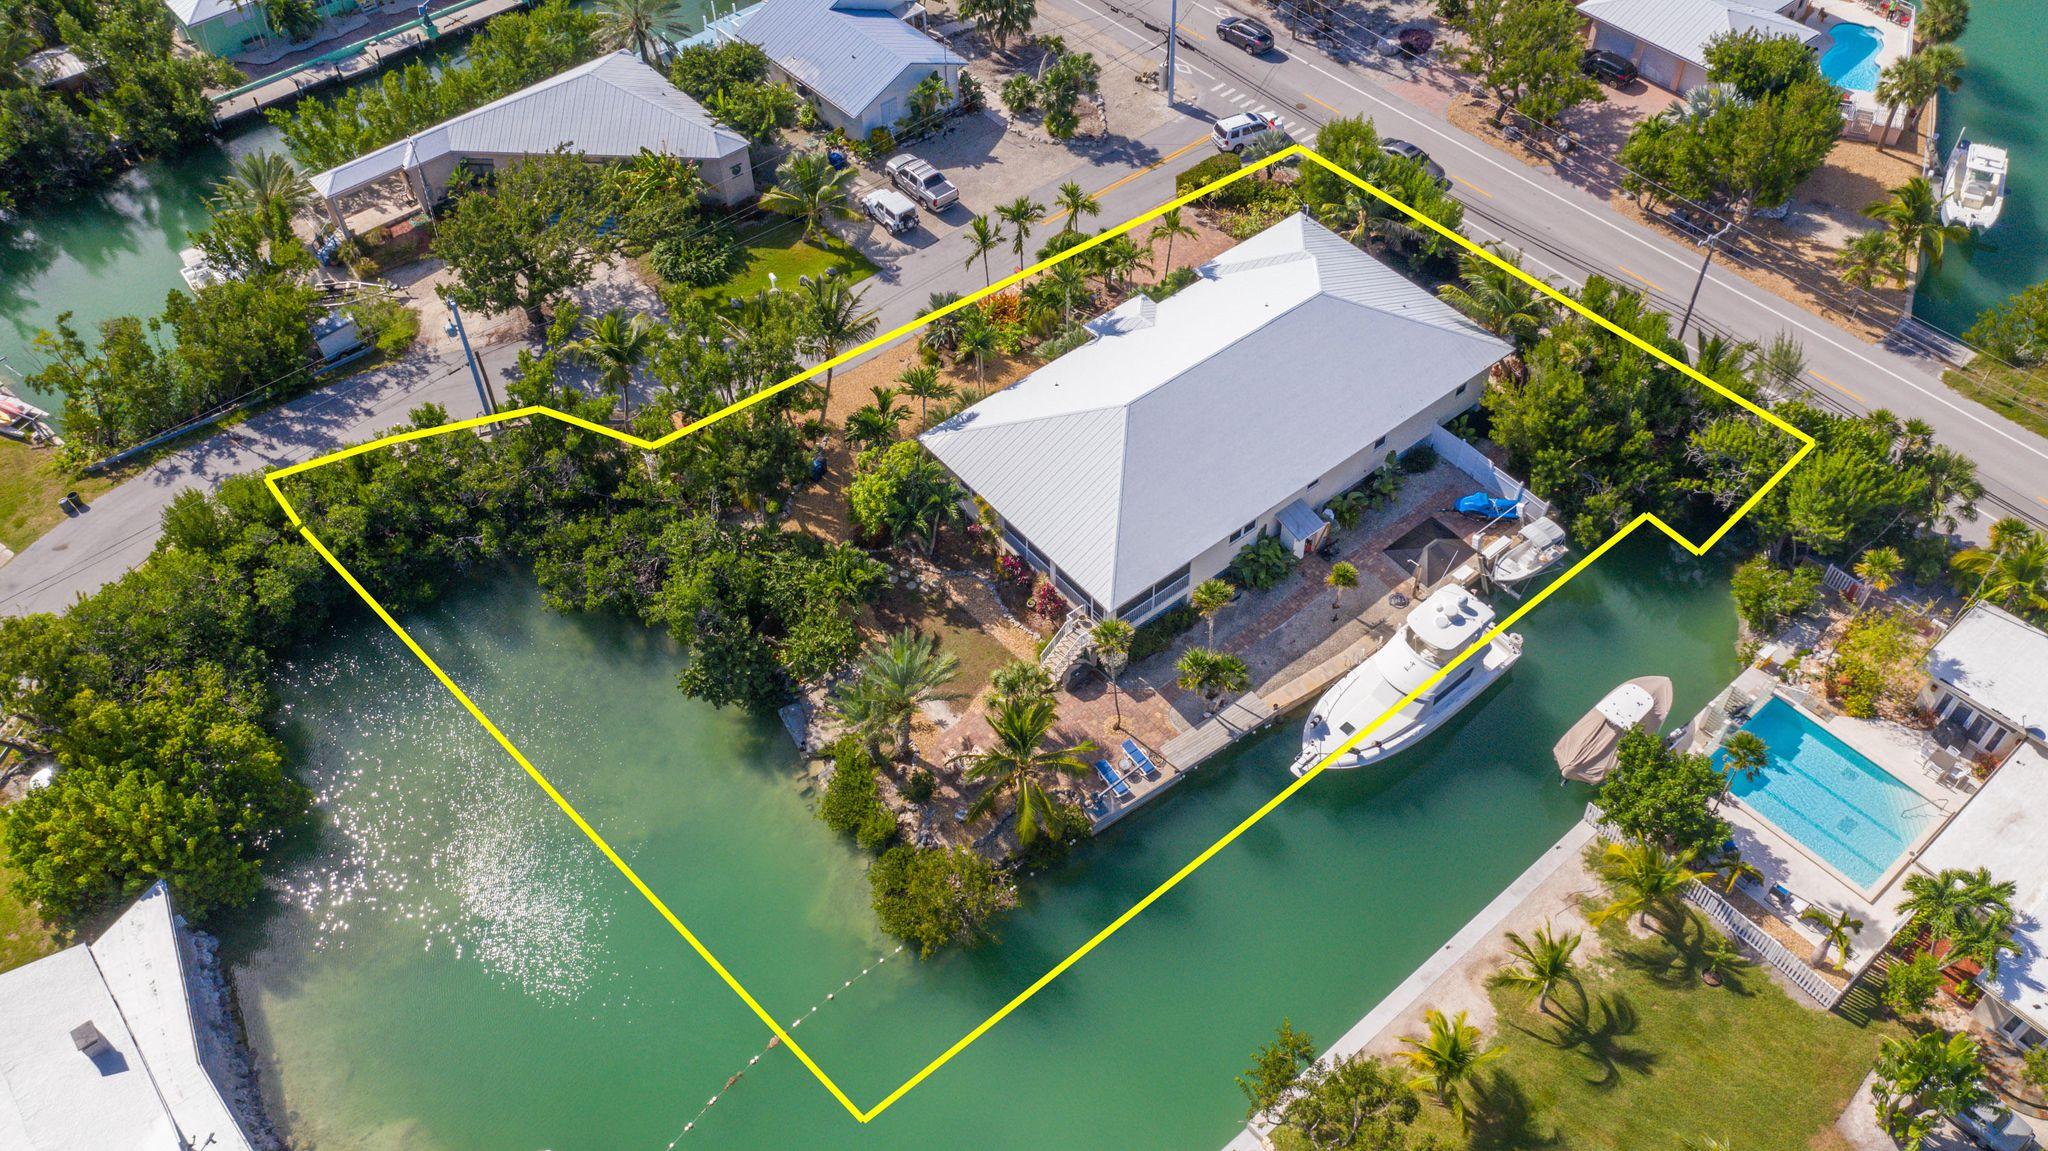 21023 2nd Ave, Cudjoe Key, FL 33042 - 3 Bed, 2 Bath Single-Family Home -  MLS #583056 - 35 Photos | Trulia